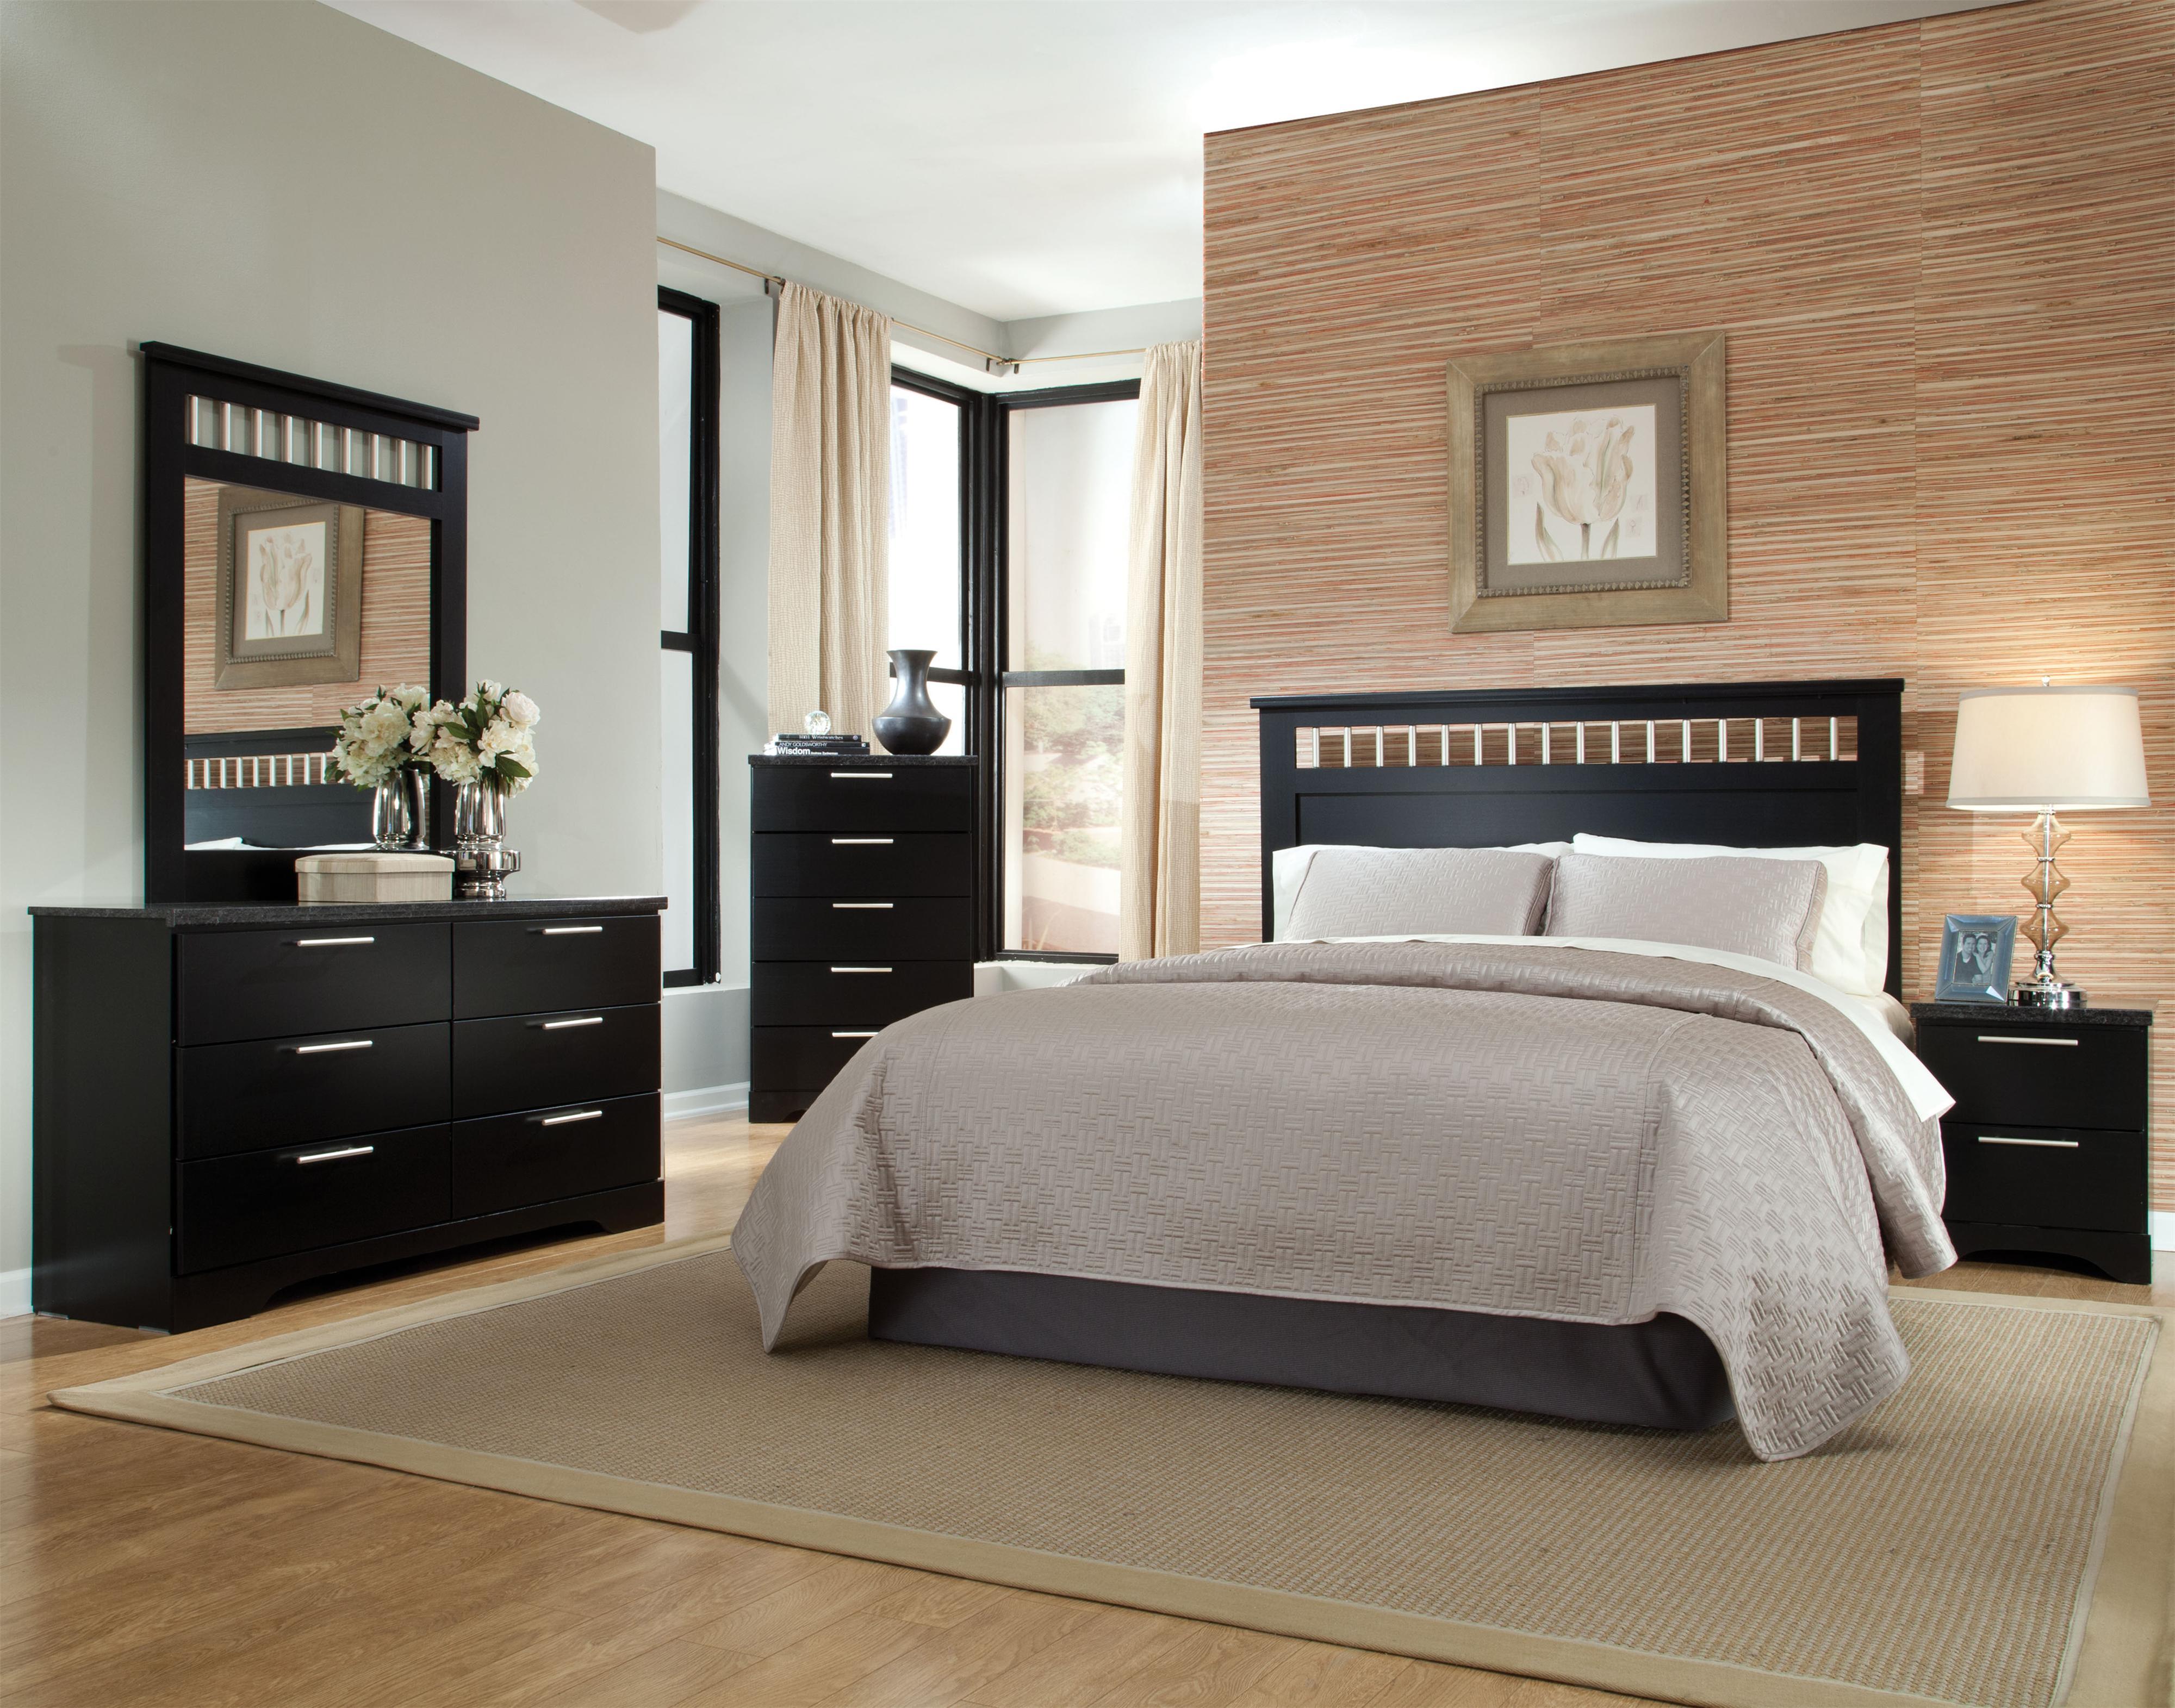 Standard Furniture Atlanta Full/Queen Bedroom Group - Item Number: 65000 F Q Bedroom Group 1